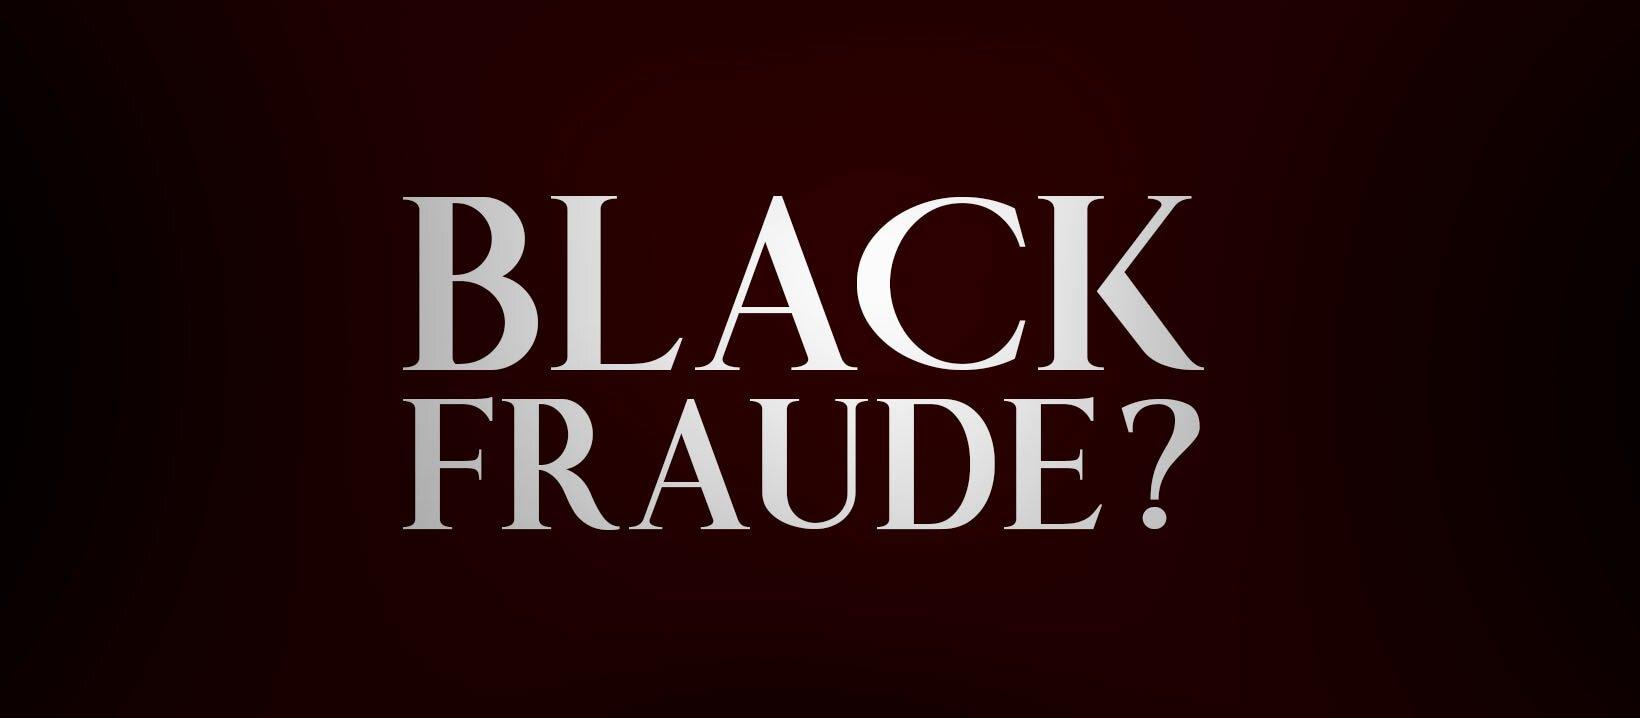 procon divulga lista negra da black friday - Procon divulga lista de sites para evitar fraudes na Black Friday